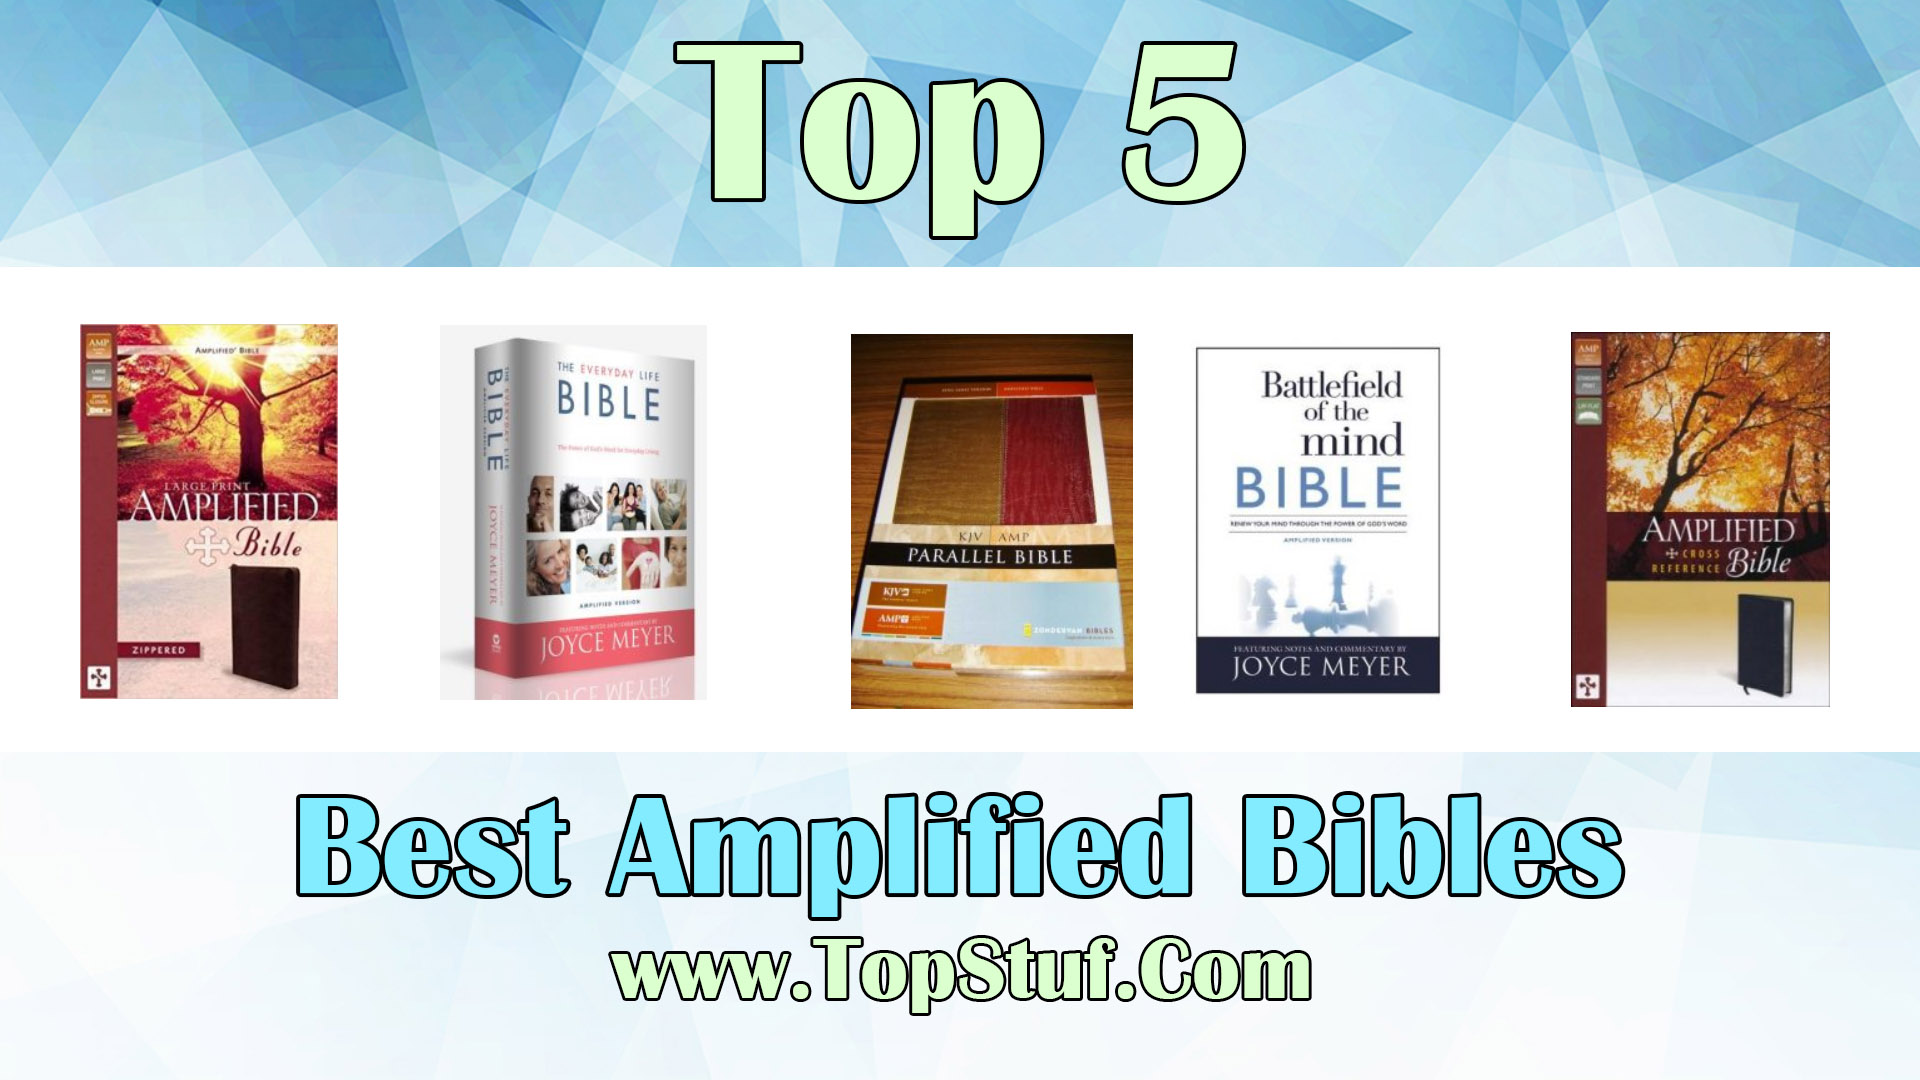 Best Amplified Bibles